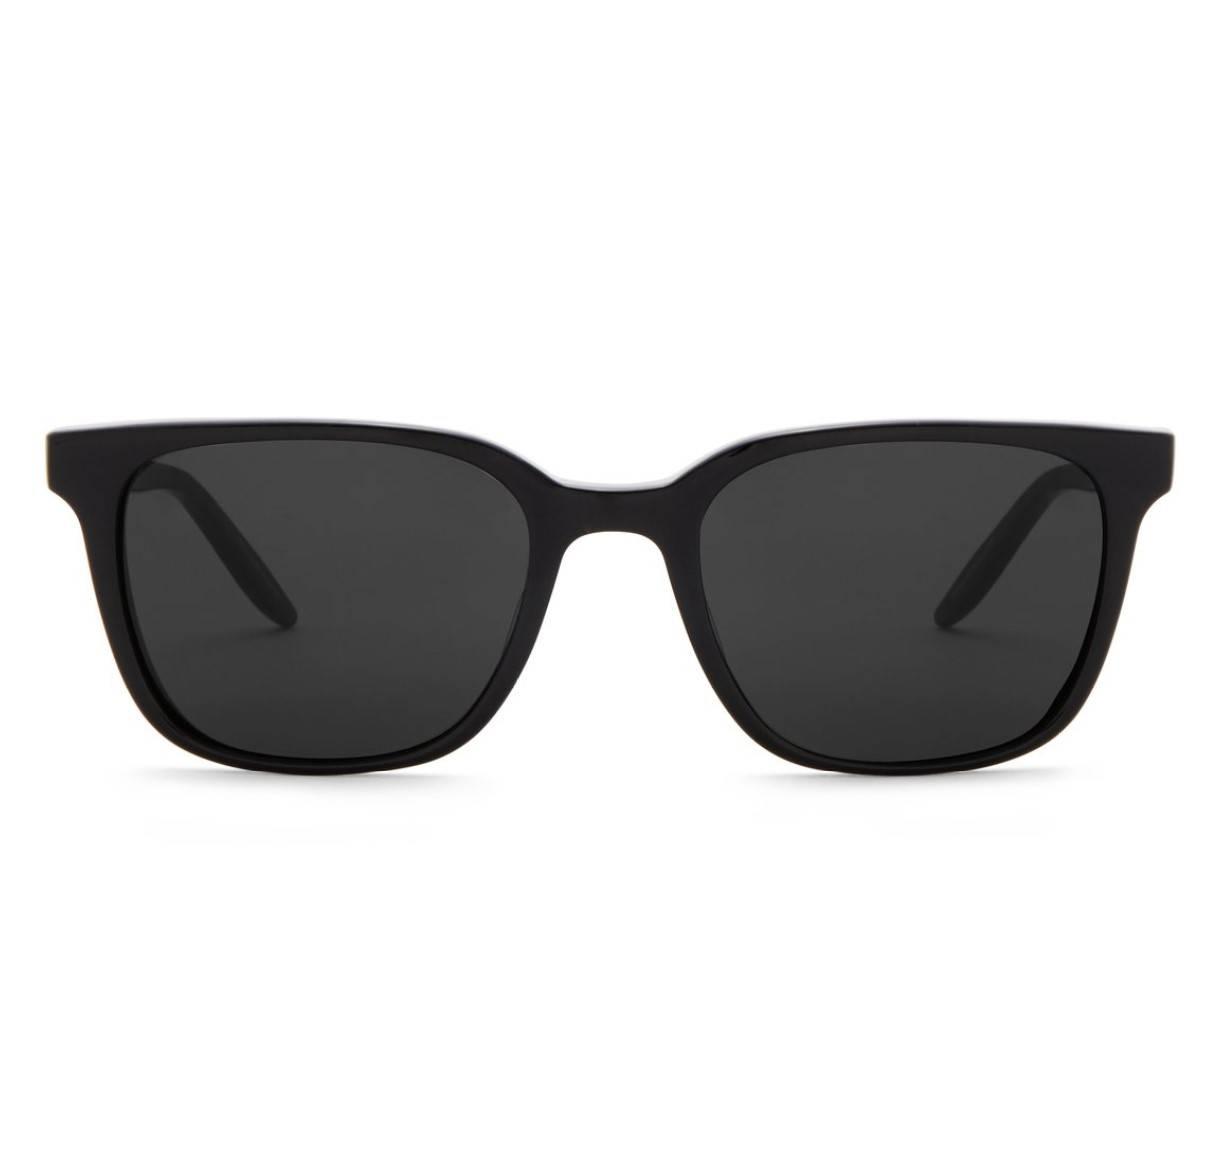 Barton Perreira Sunglasses Joe